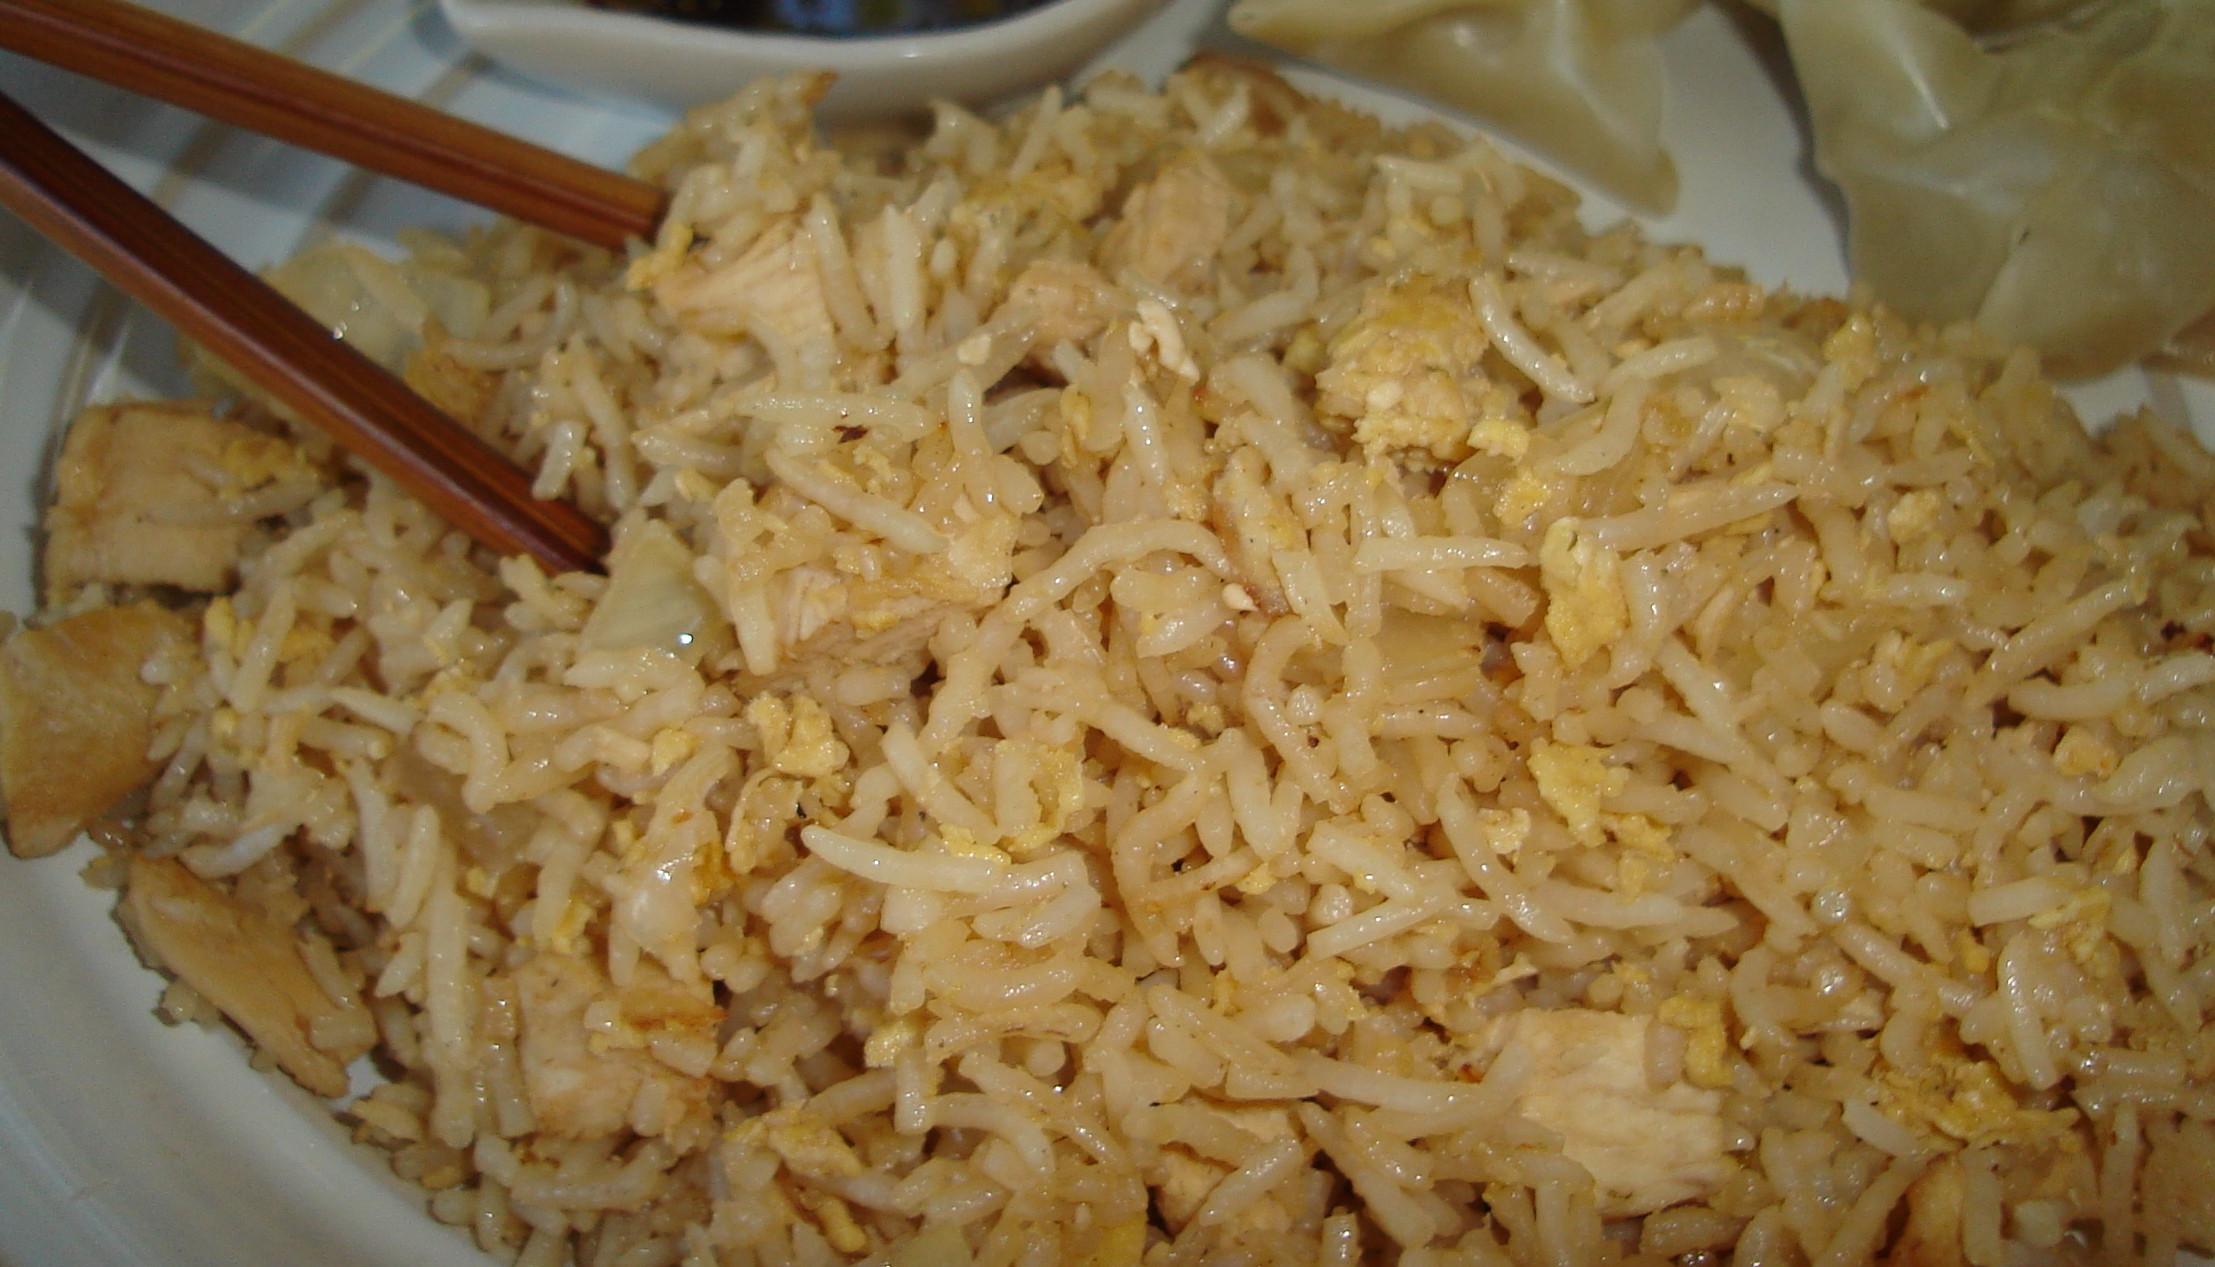 Plain Fried Rice  plain fried rice without egg